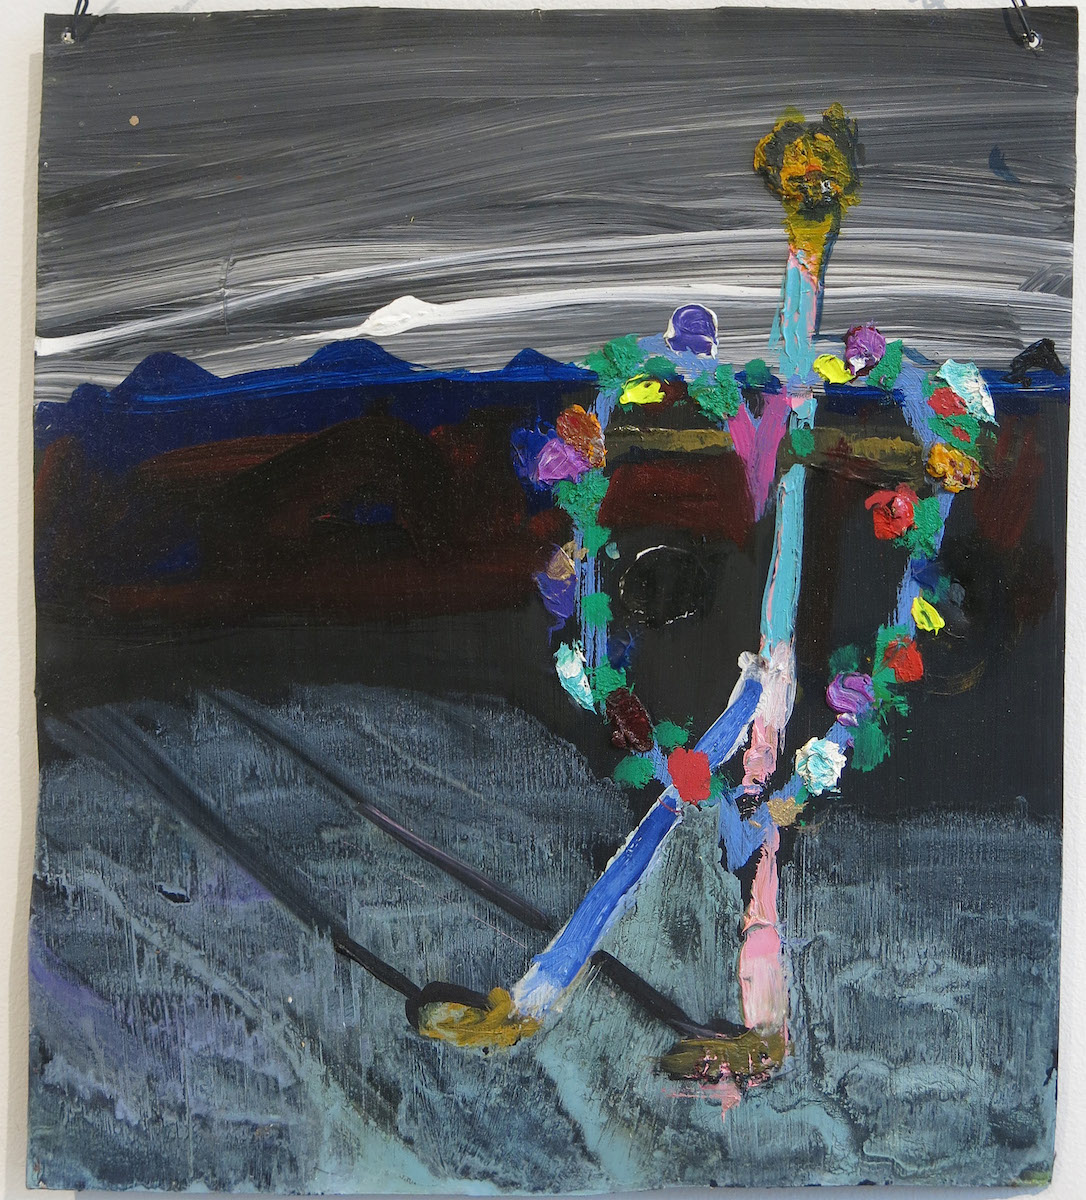 Matt Blackwell, Wandering Sign (Retablo), 2014, mixed media on tin, 10.75h x 9.5w in.